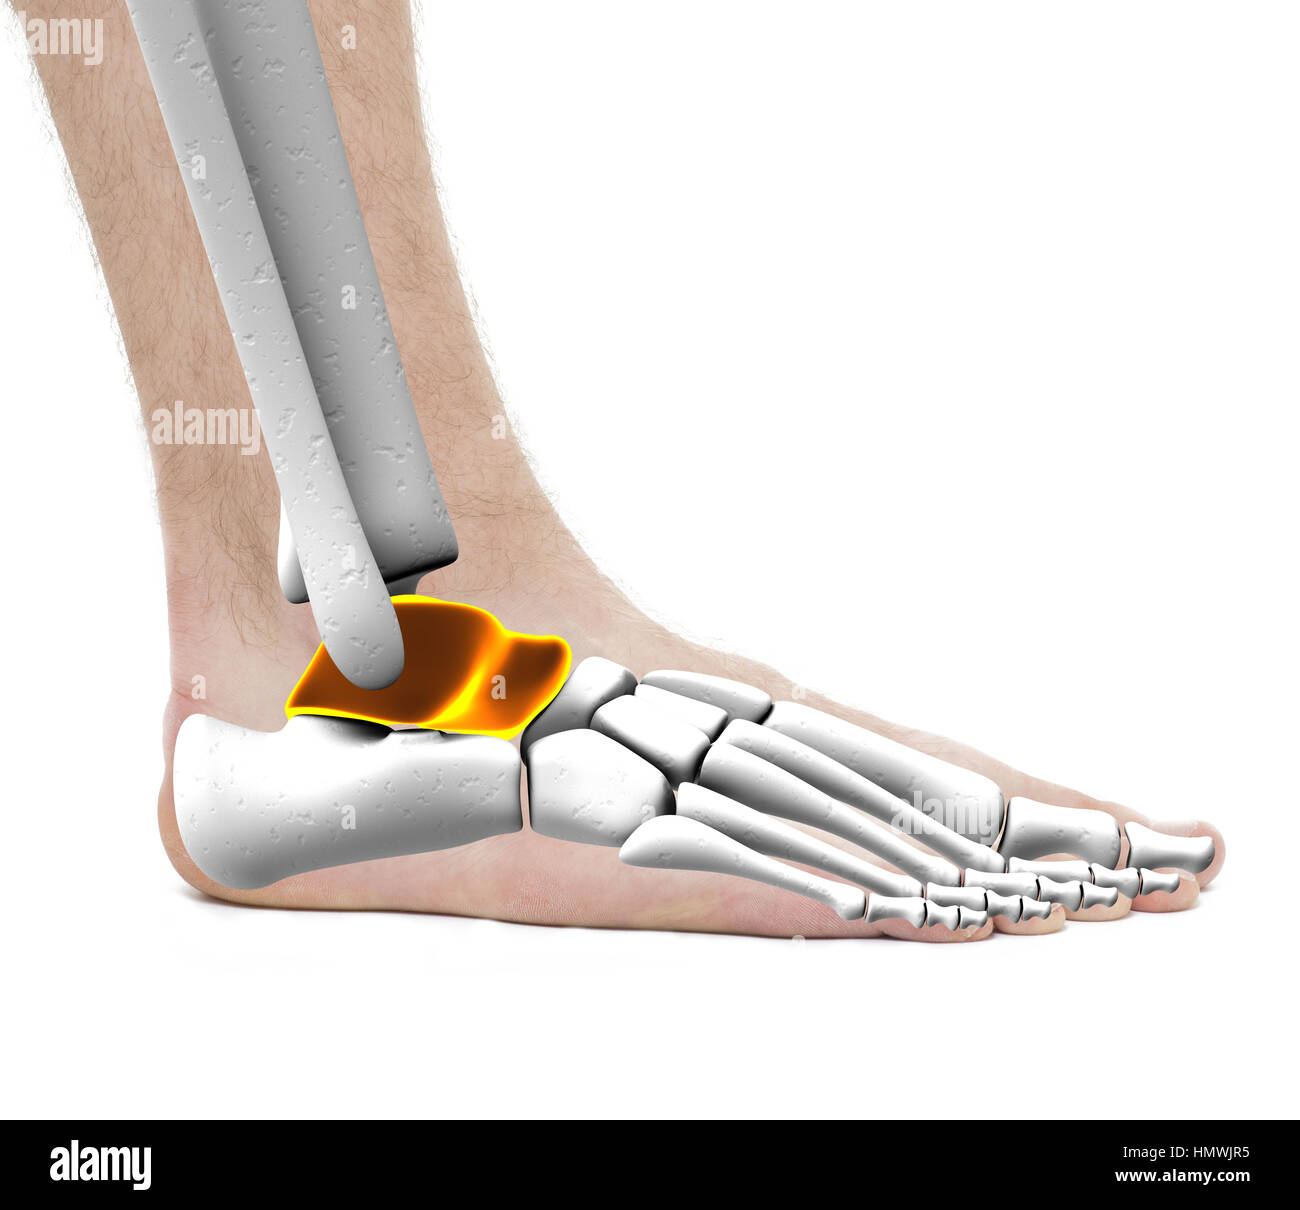 Foot Ankle Bones Anatomy Male Stock Photos & Foot Ankle Bones ...